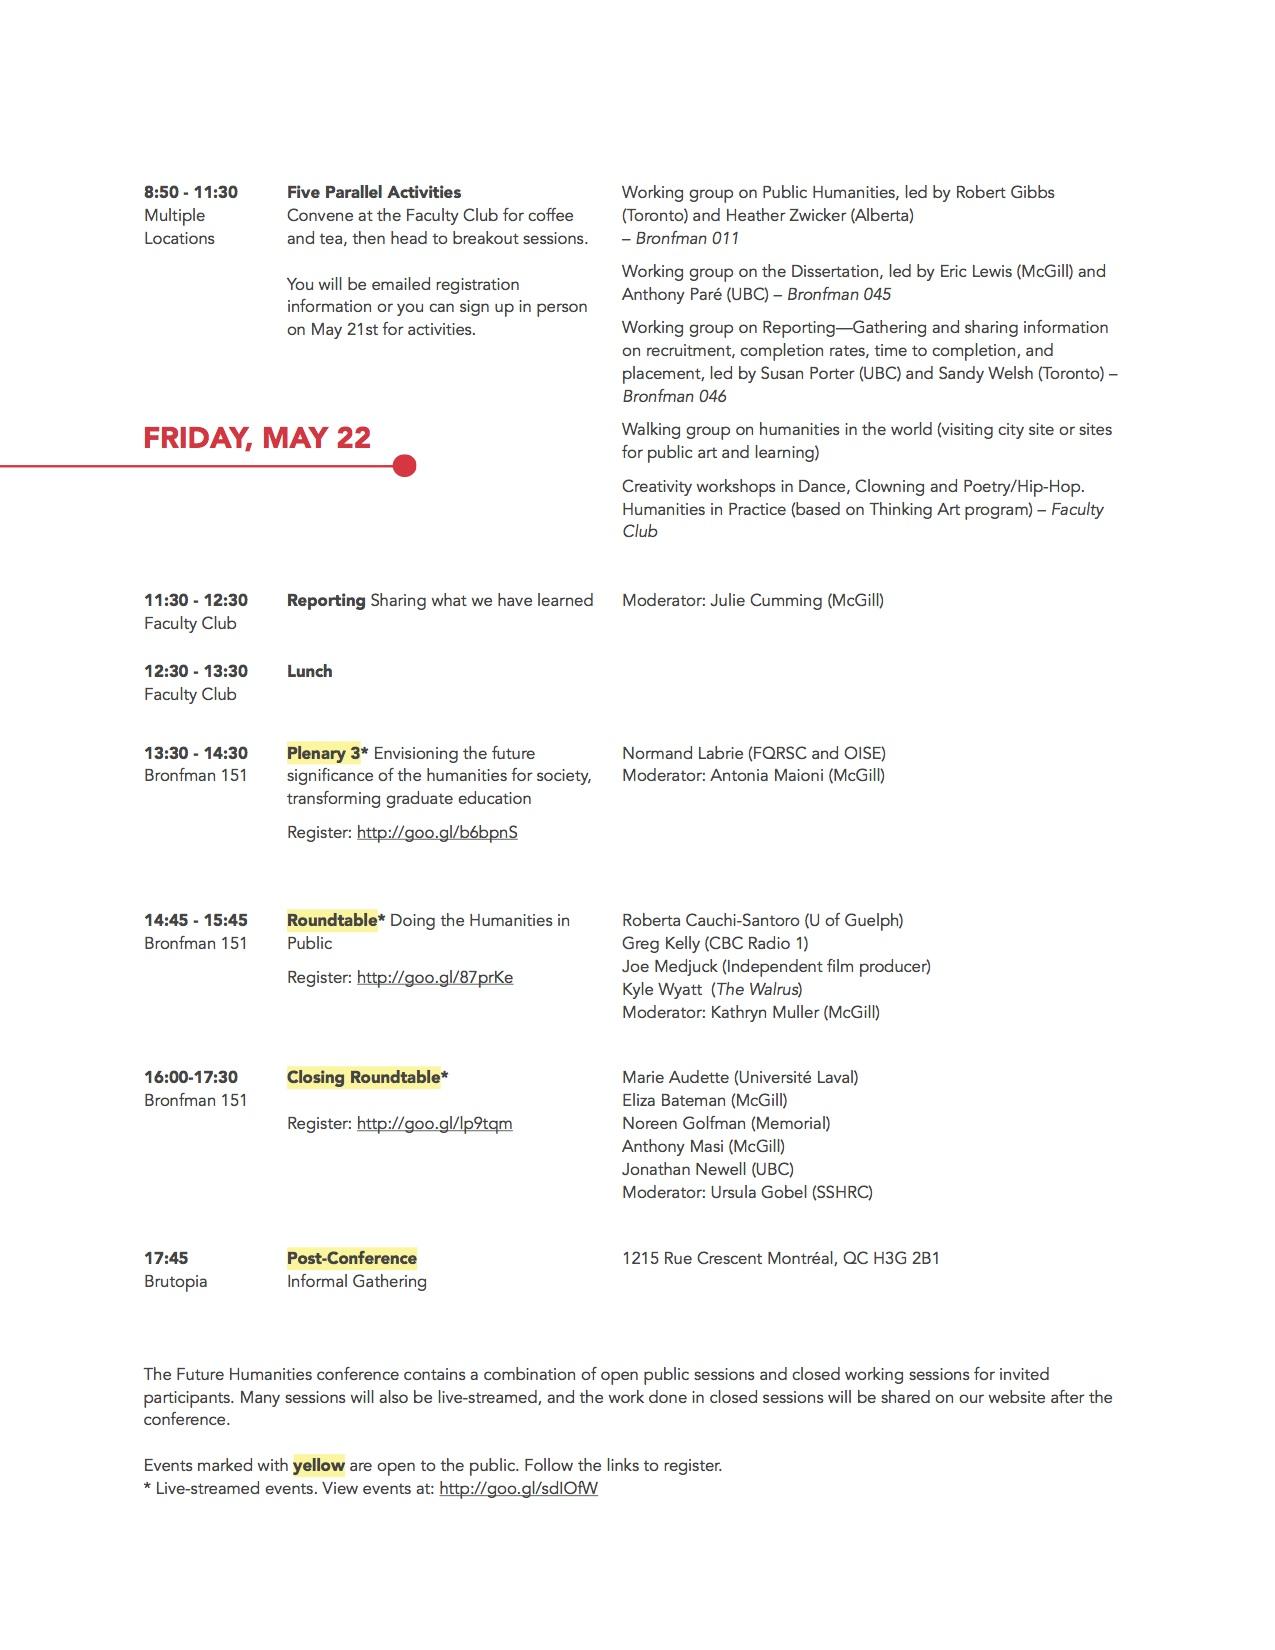 FH Conference Program FINAL 3.jpg